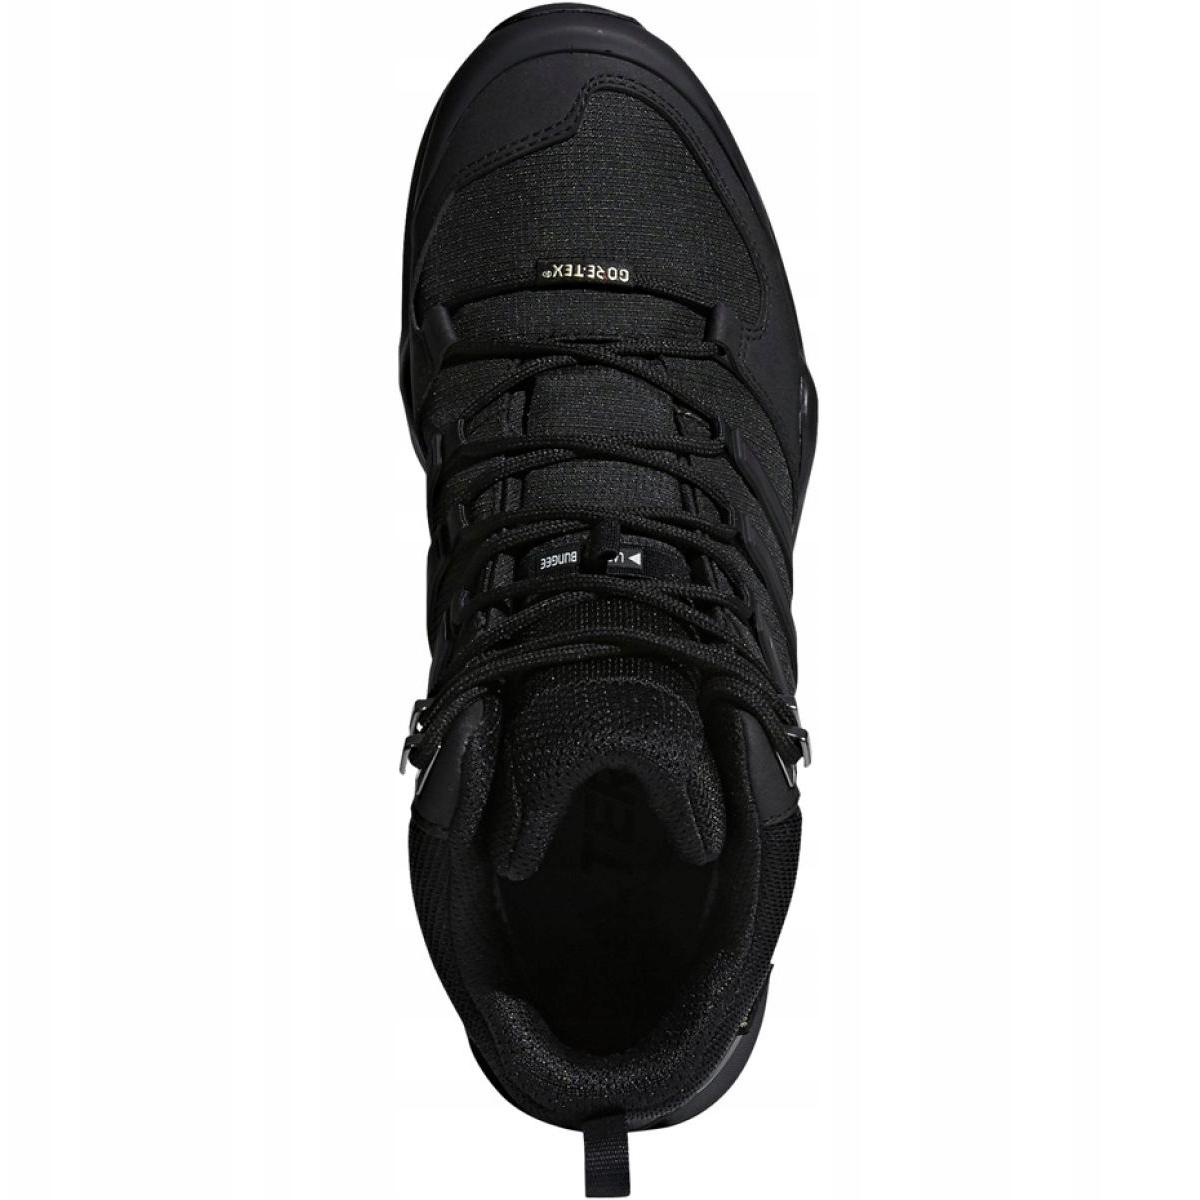 Buty adidas Terrex Swift R2 Mid Gtx M CM7500 czarne